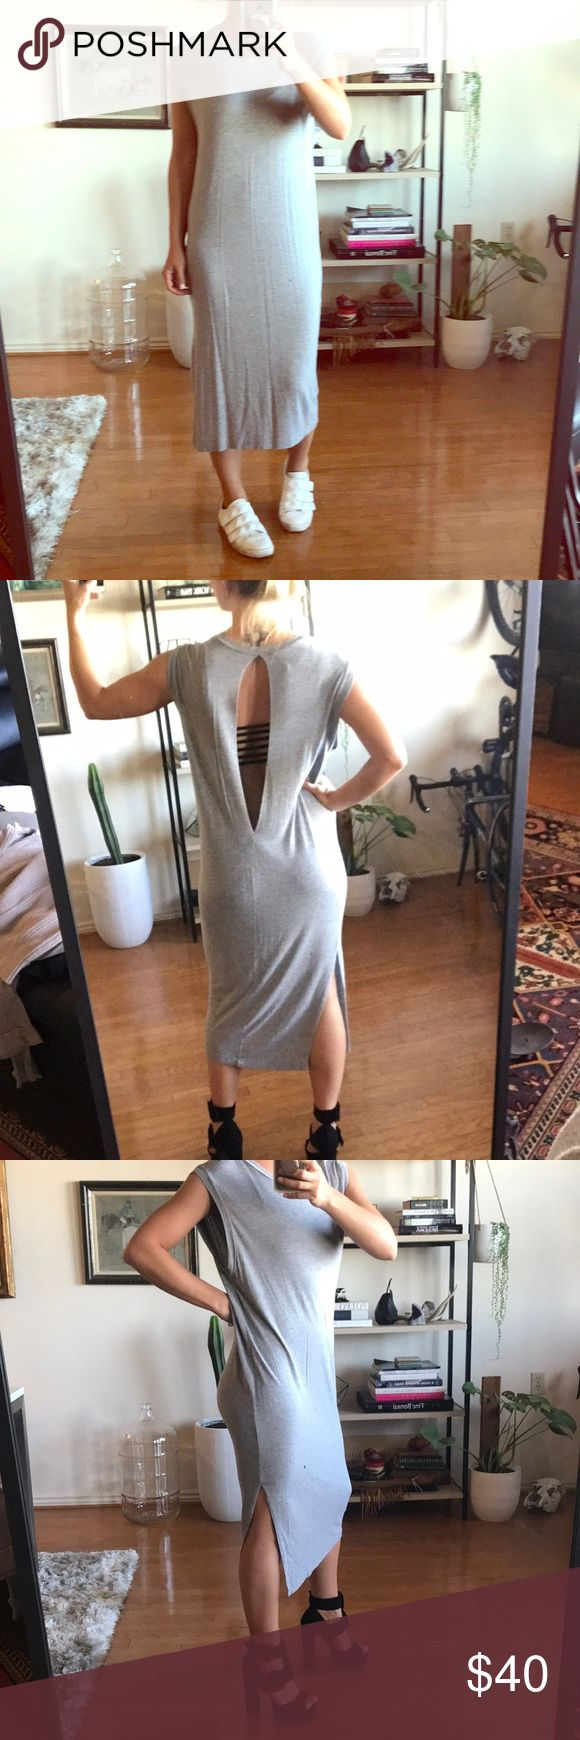 87 Best My Posh Closet Images On Pinterest Minimal Mosa Mixed Top Navy Xs Silence Noise Open Back Sleeveless T Shirt Dress